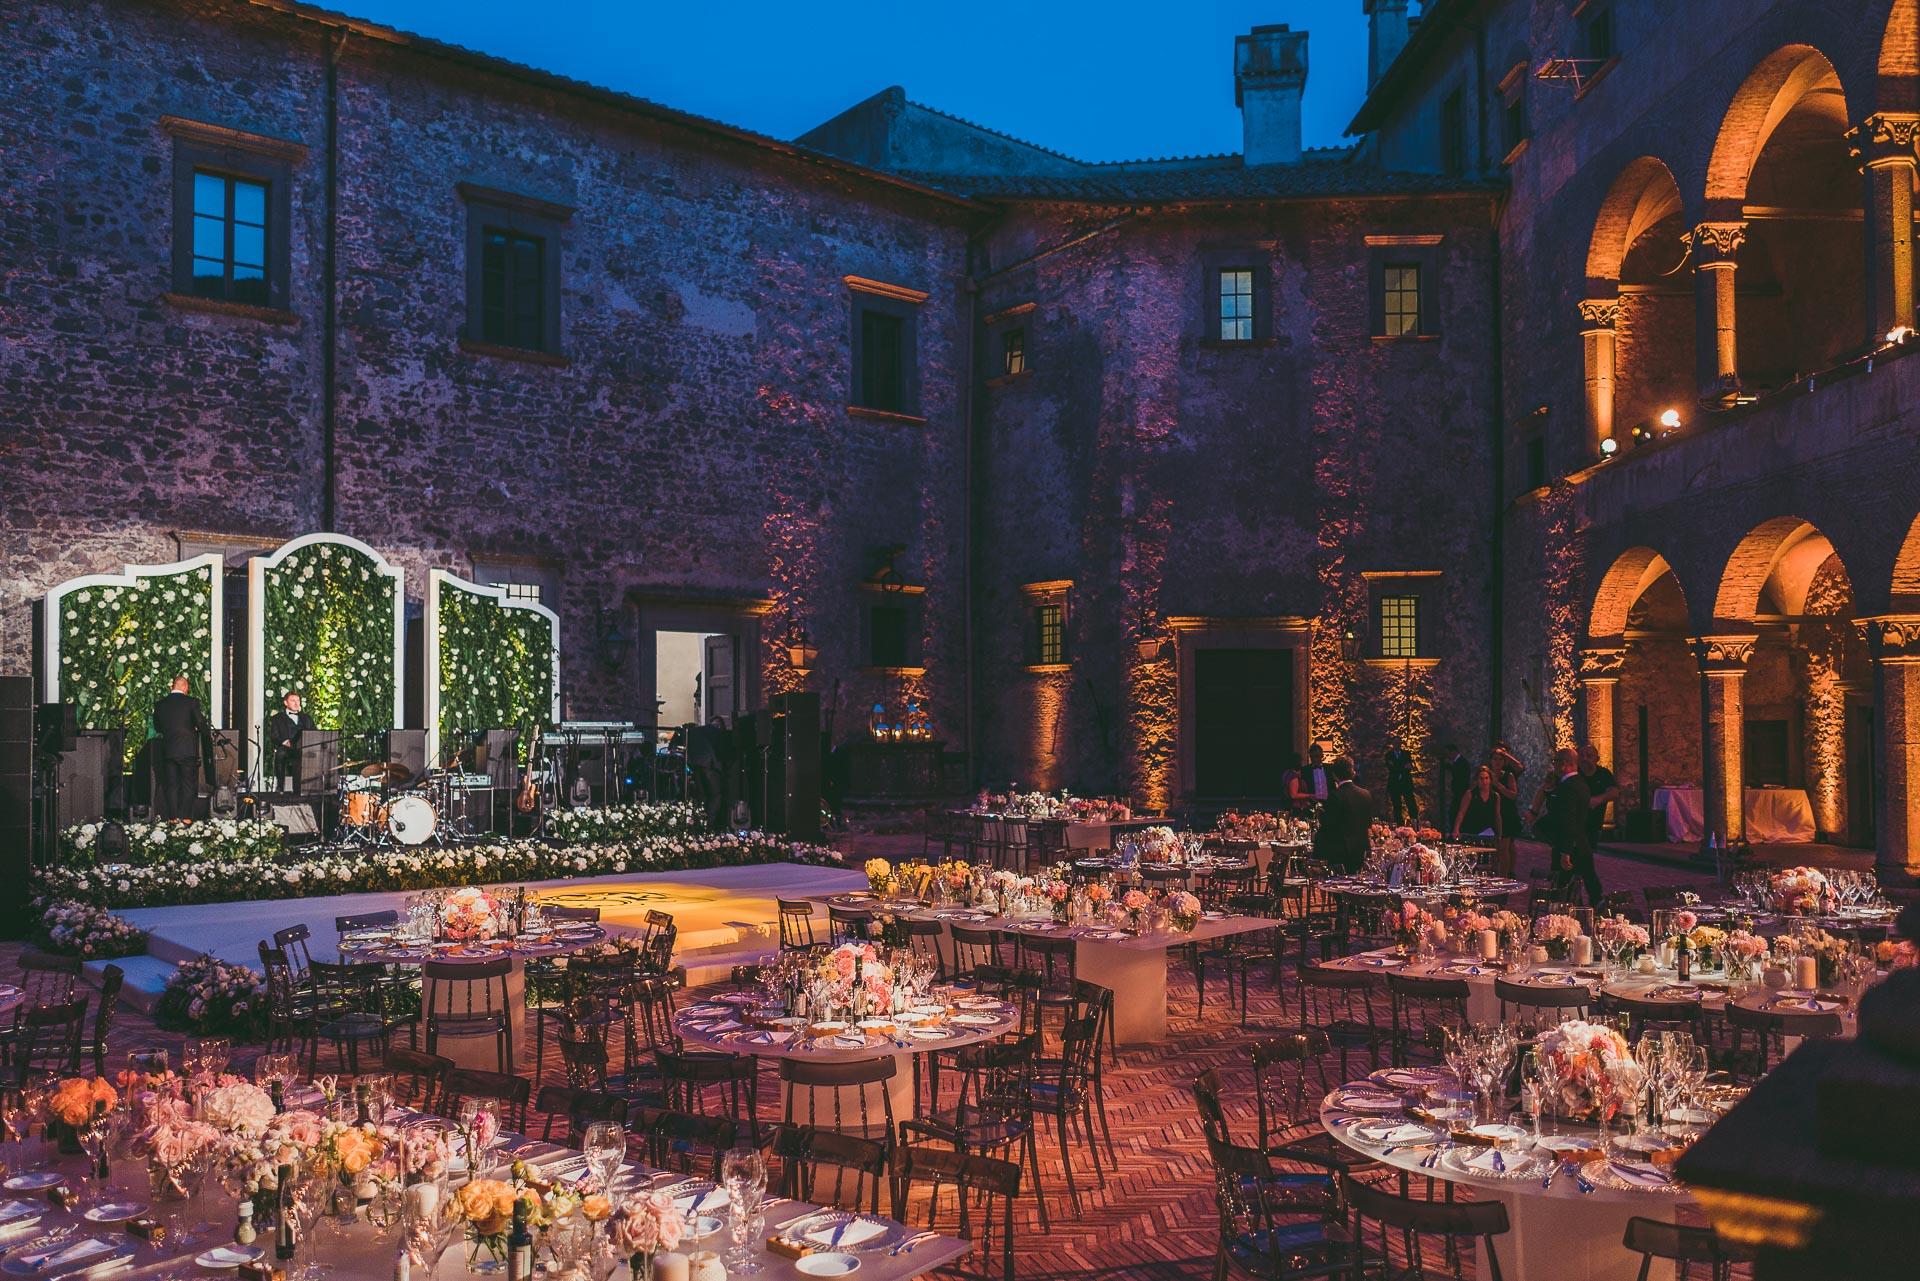 sebastian-flowers-events-photo-stefano-casati